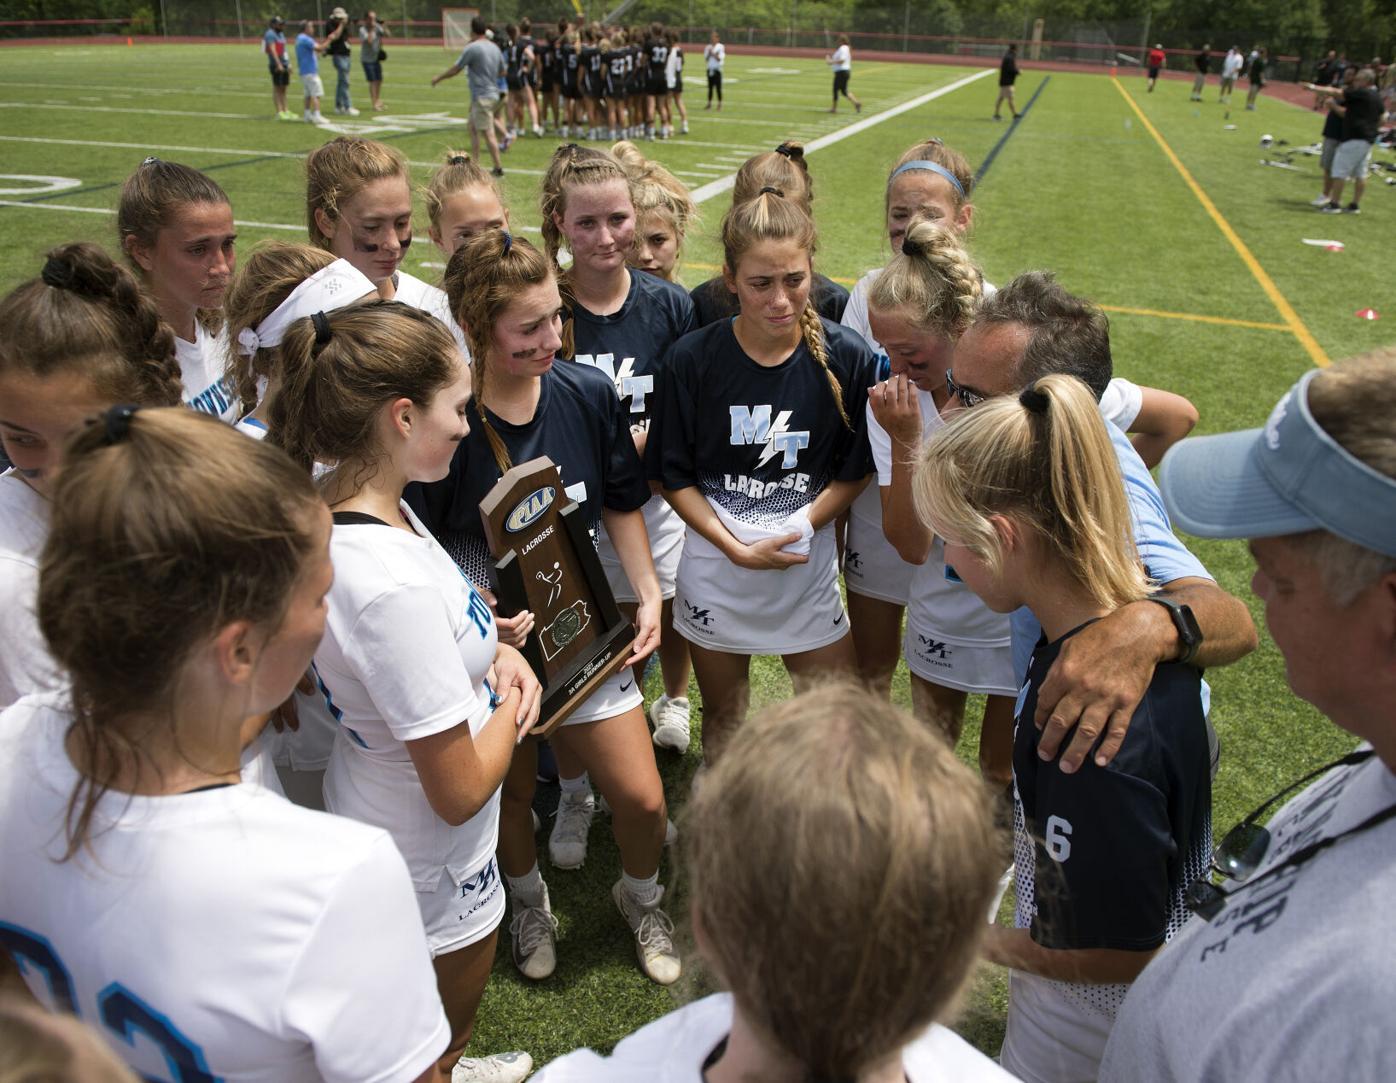 Manheim Twp. vs. Radnor- PIAA 3A girls lacrosse championships